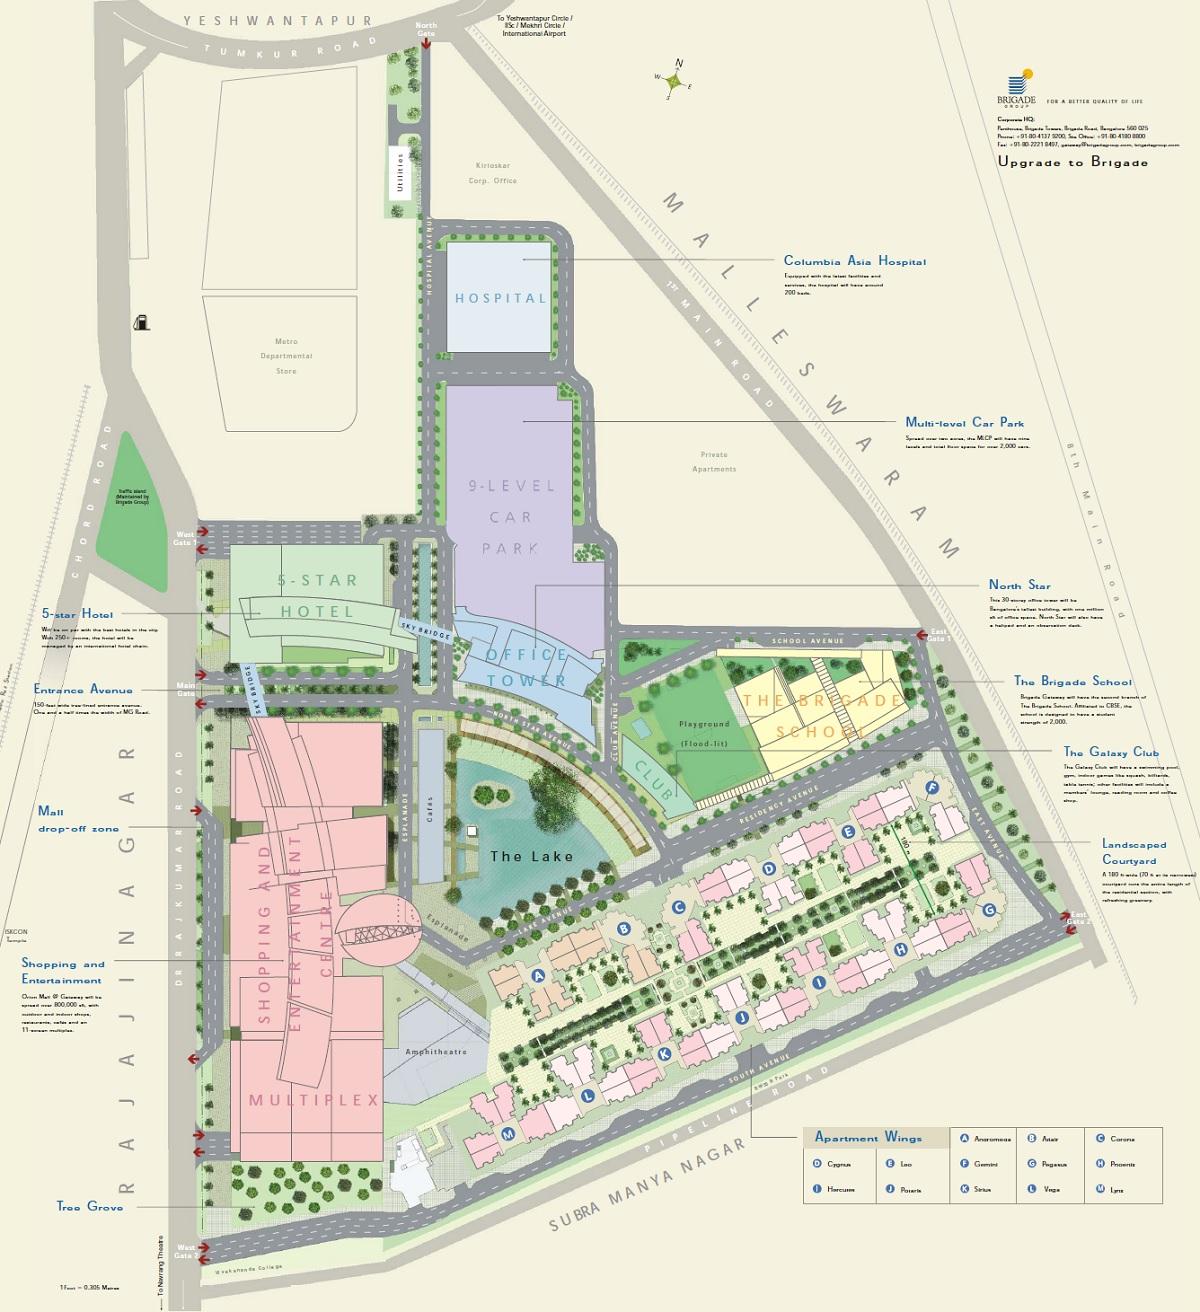 master-plan-image-Picture-brigade-gateway-enclave-2731452